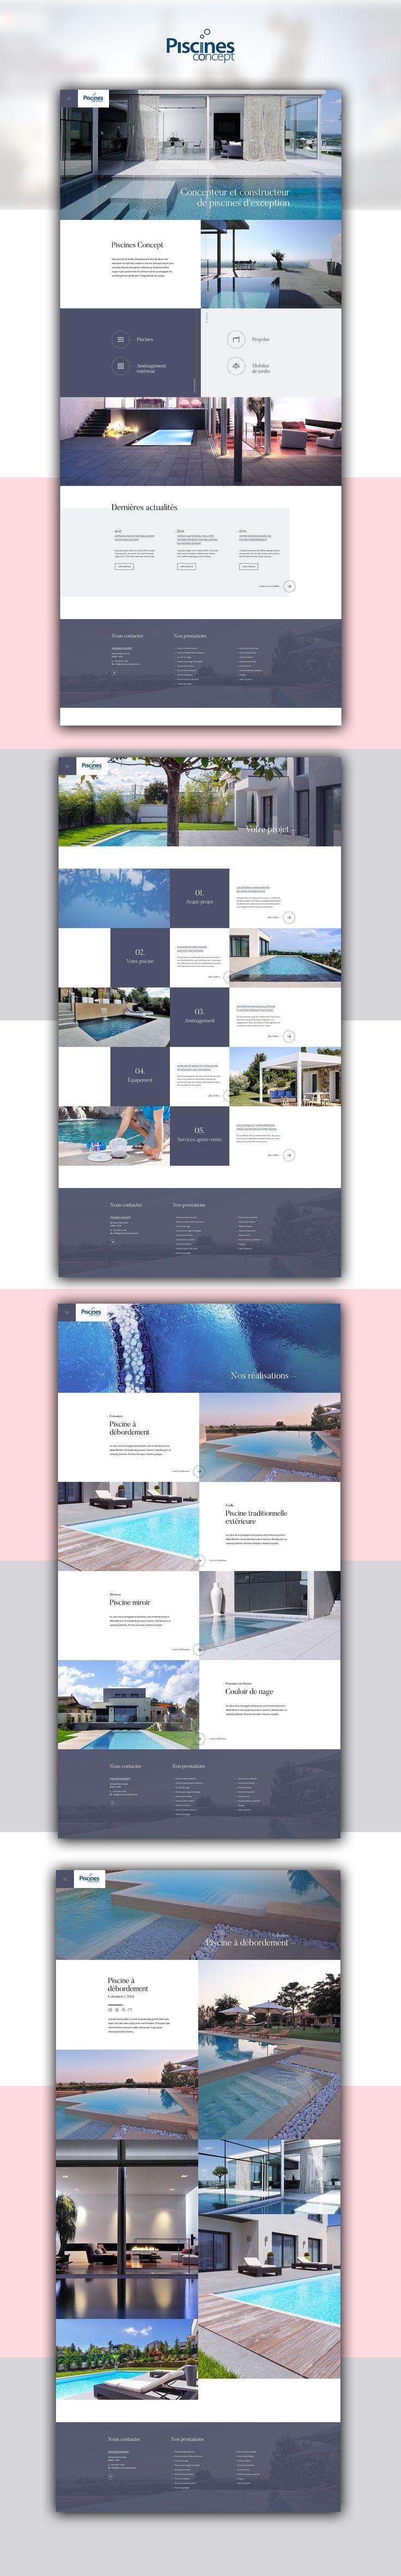 Maquette web — Piscines Concept #webdesign #website #design #piscine #swimming #pool #blue #template